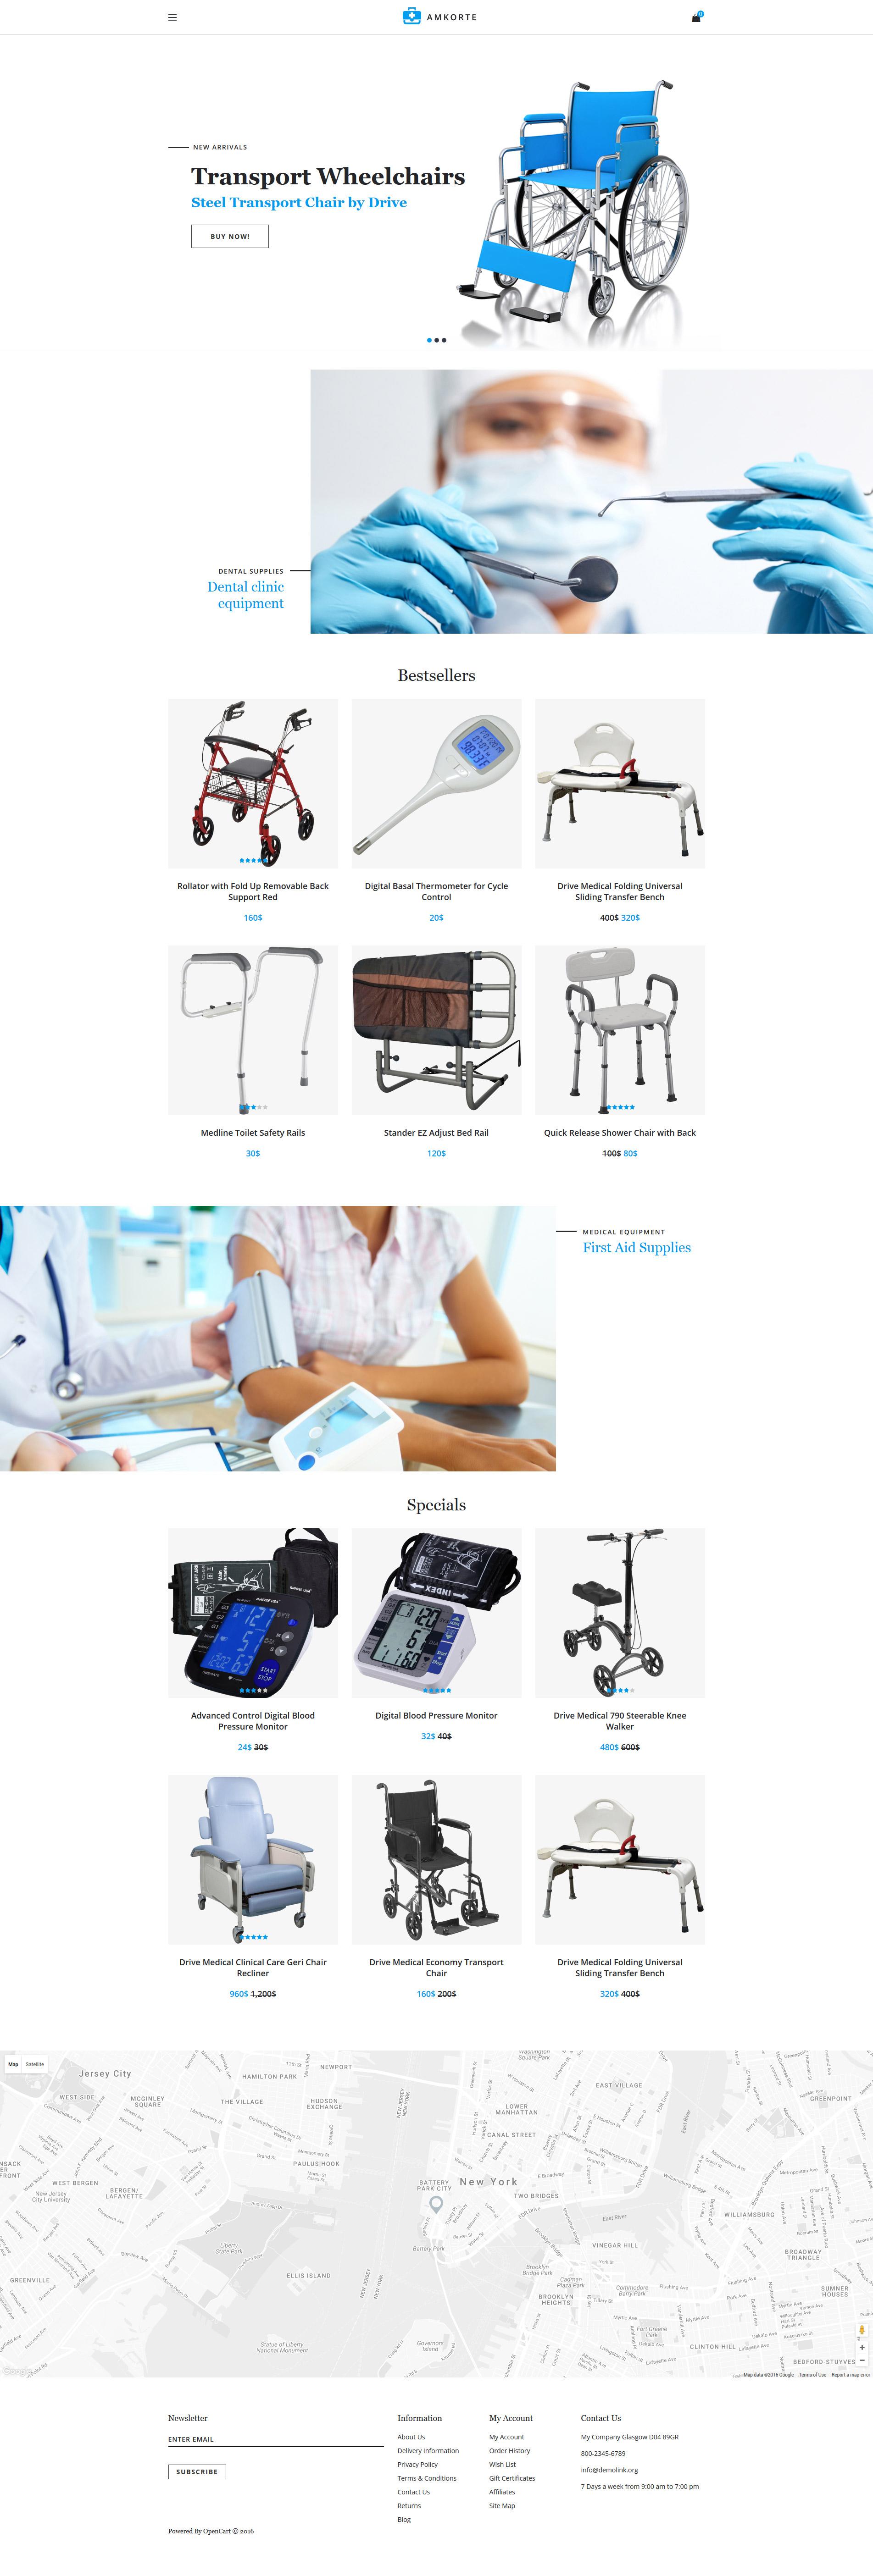 Amkorte - Medical Equipment Store №61383 - скриншот